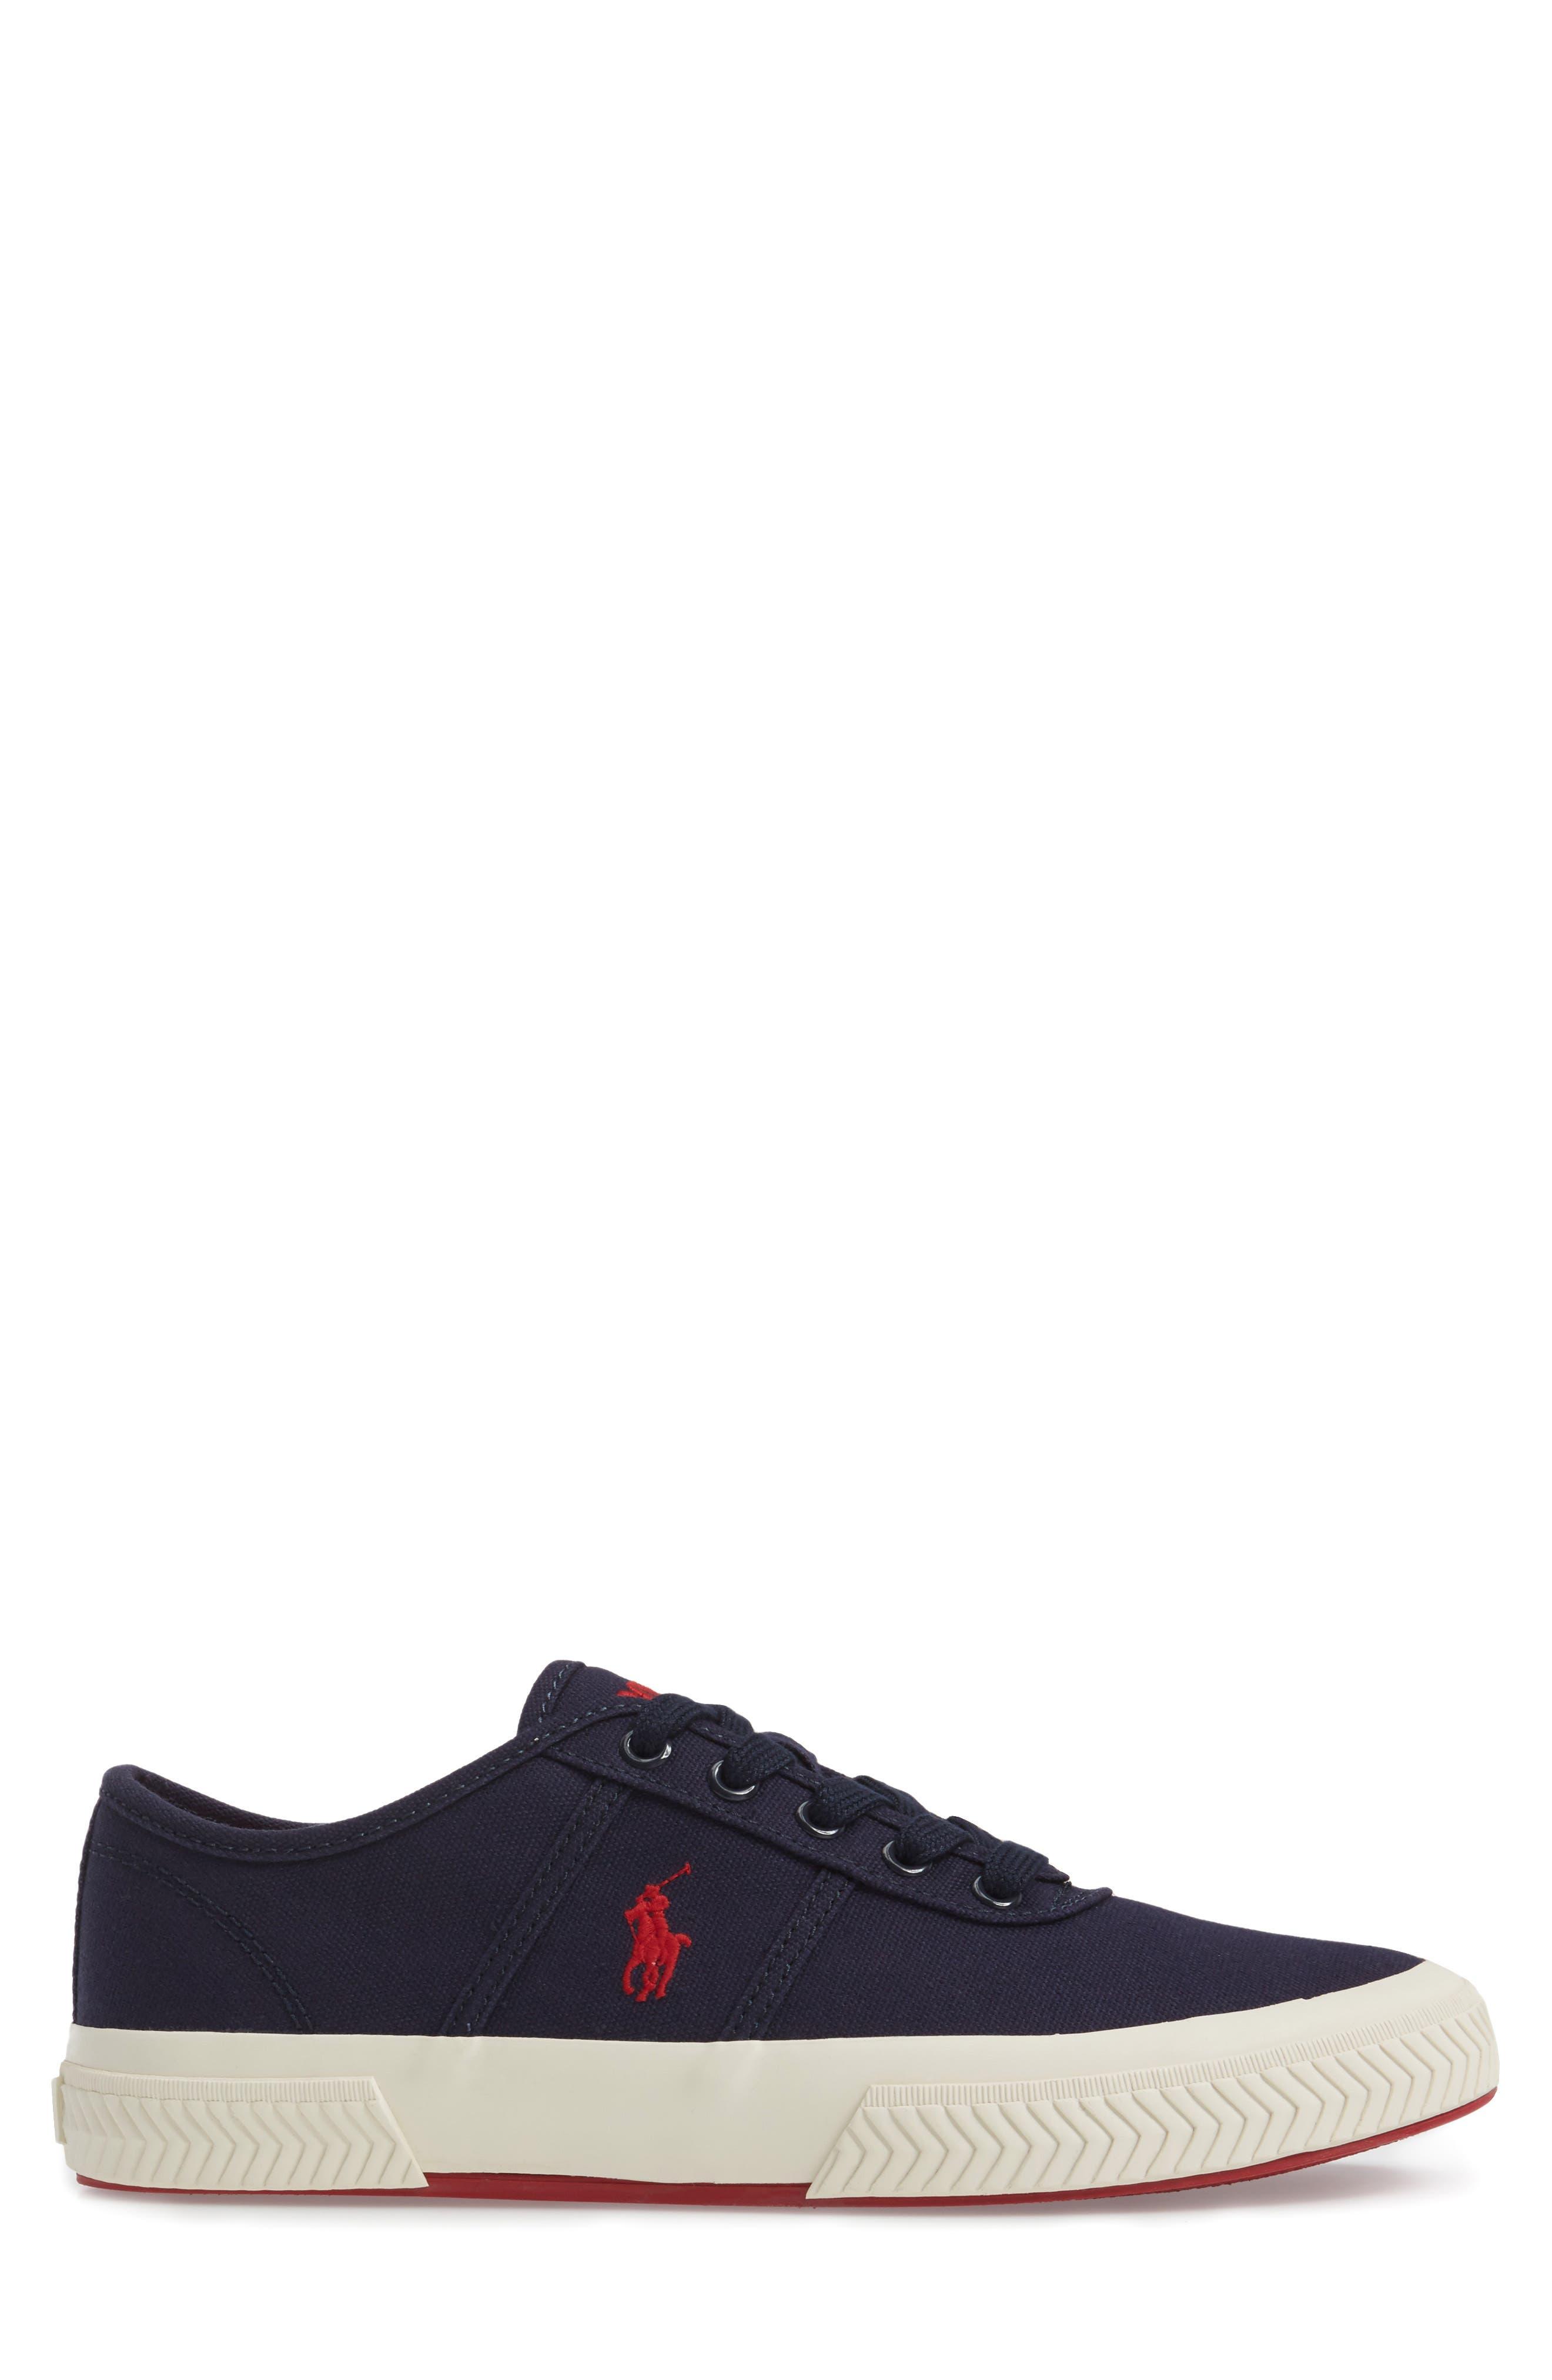 Polo Ralph Lauren Tyrian Sneaker,                             Alternate thumbnail 3, color,                             Newport Navy